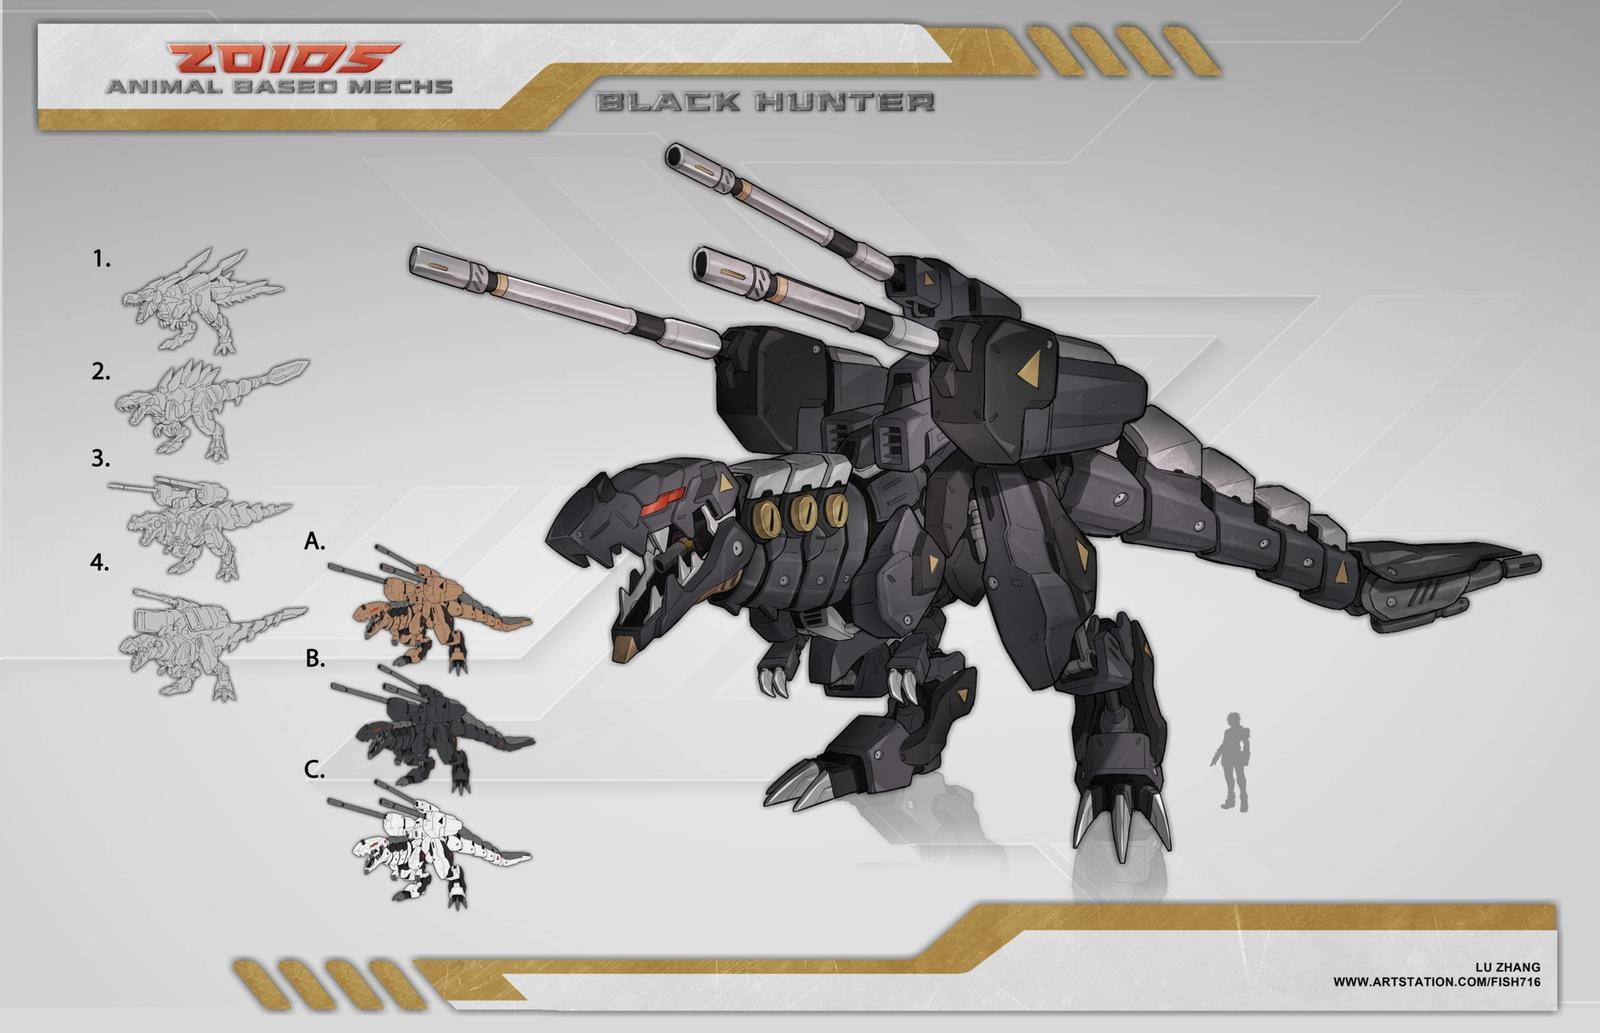 Black Hunter - Zoids